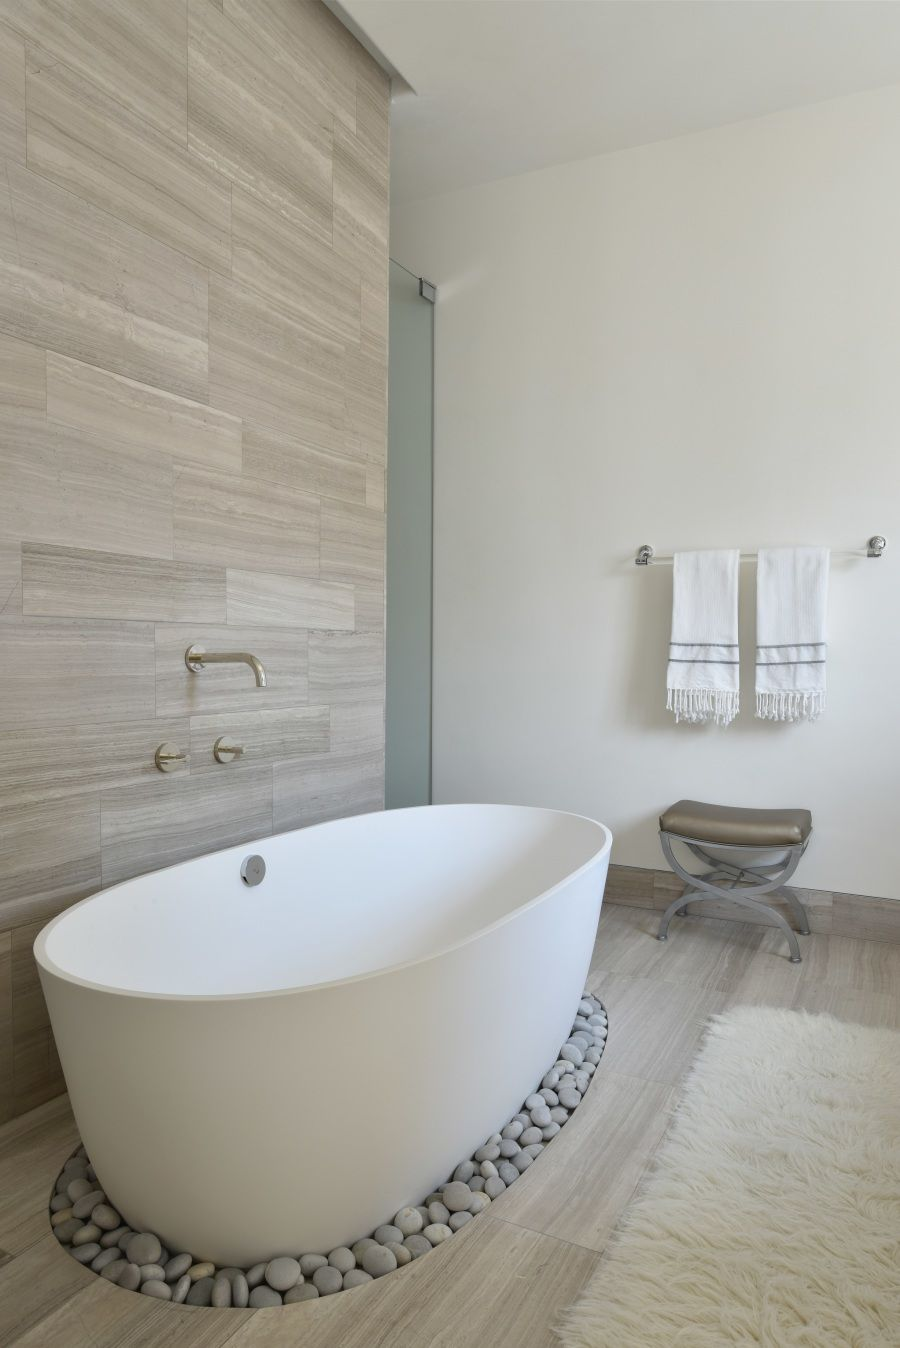 5 Things Every Dream House Needs Relaxing Bathroom Bathroom